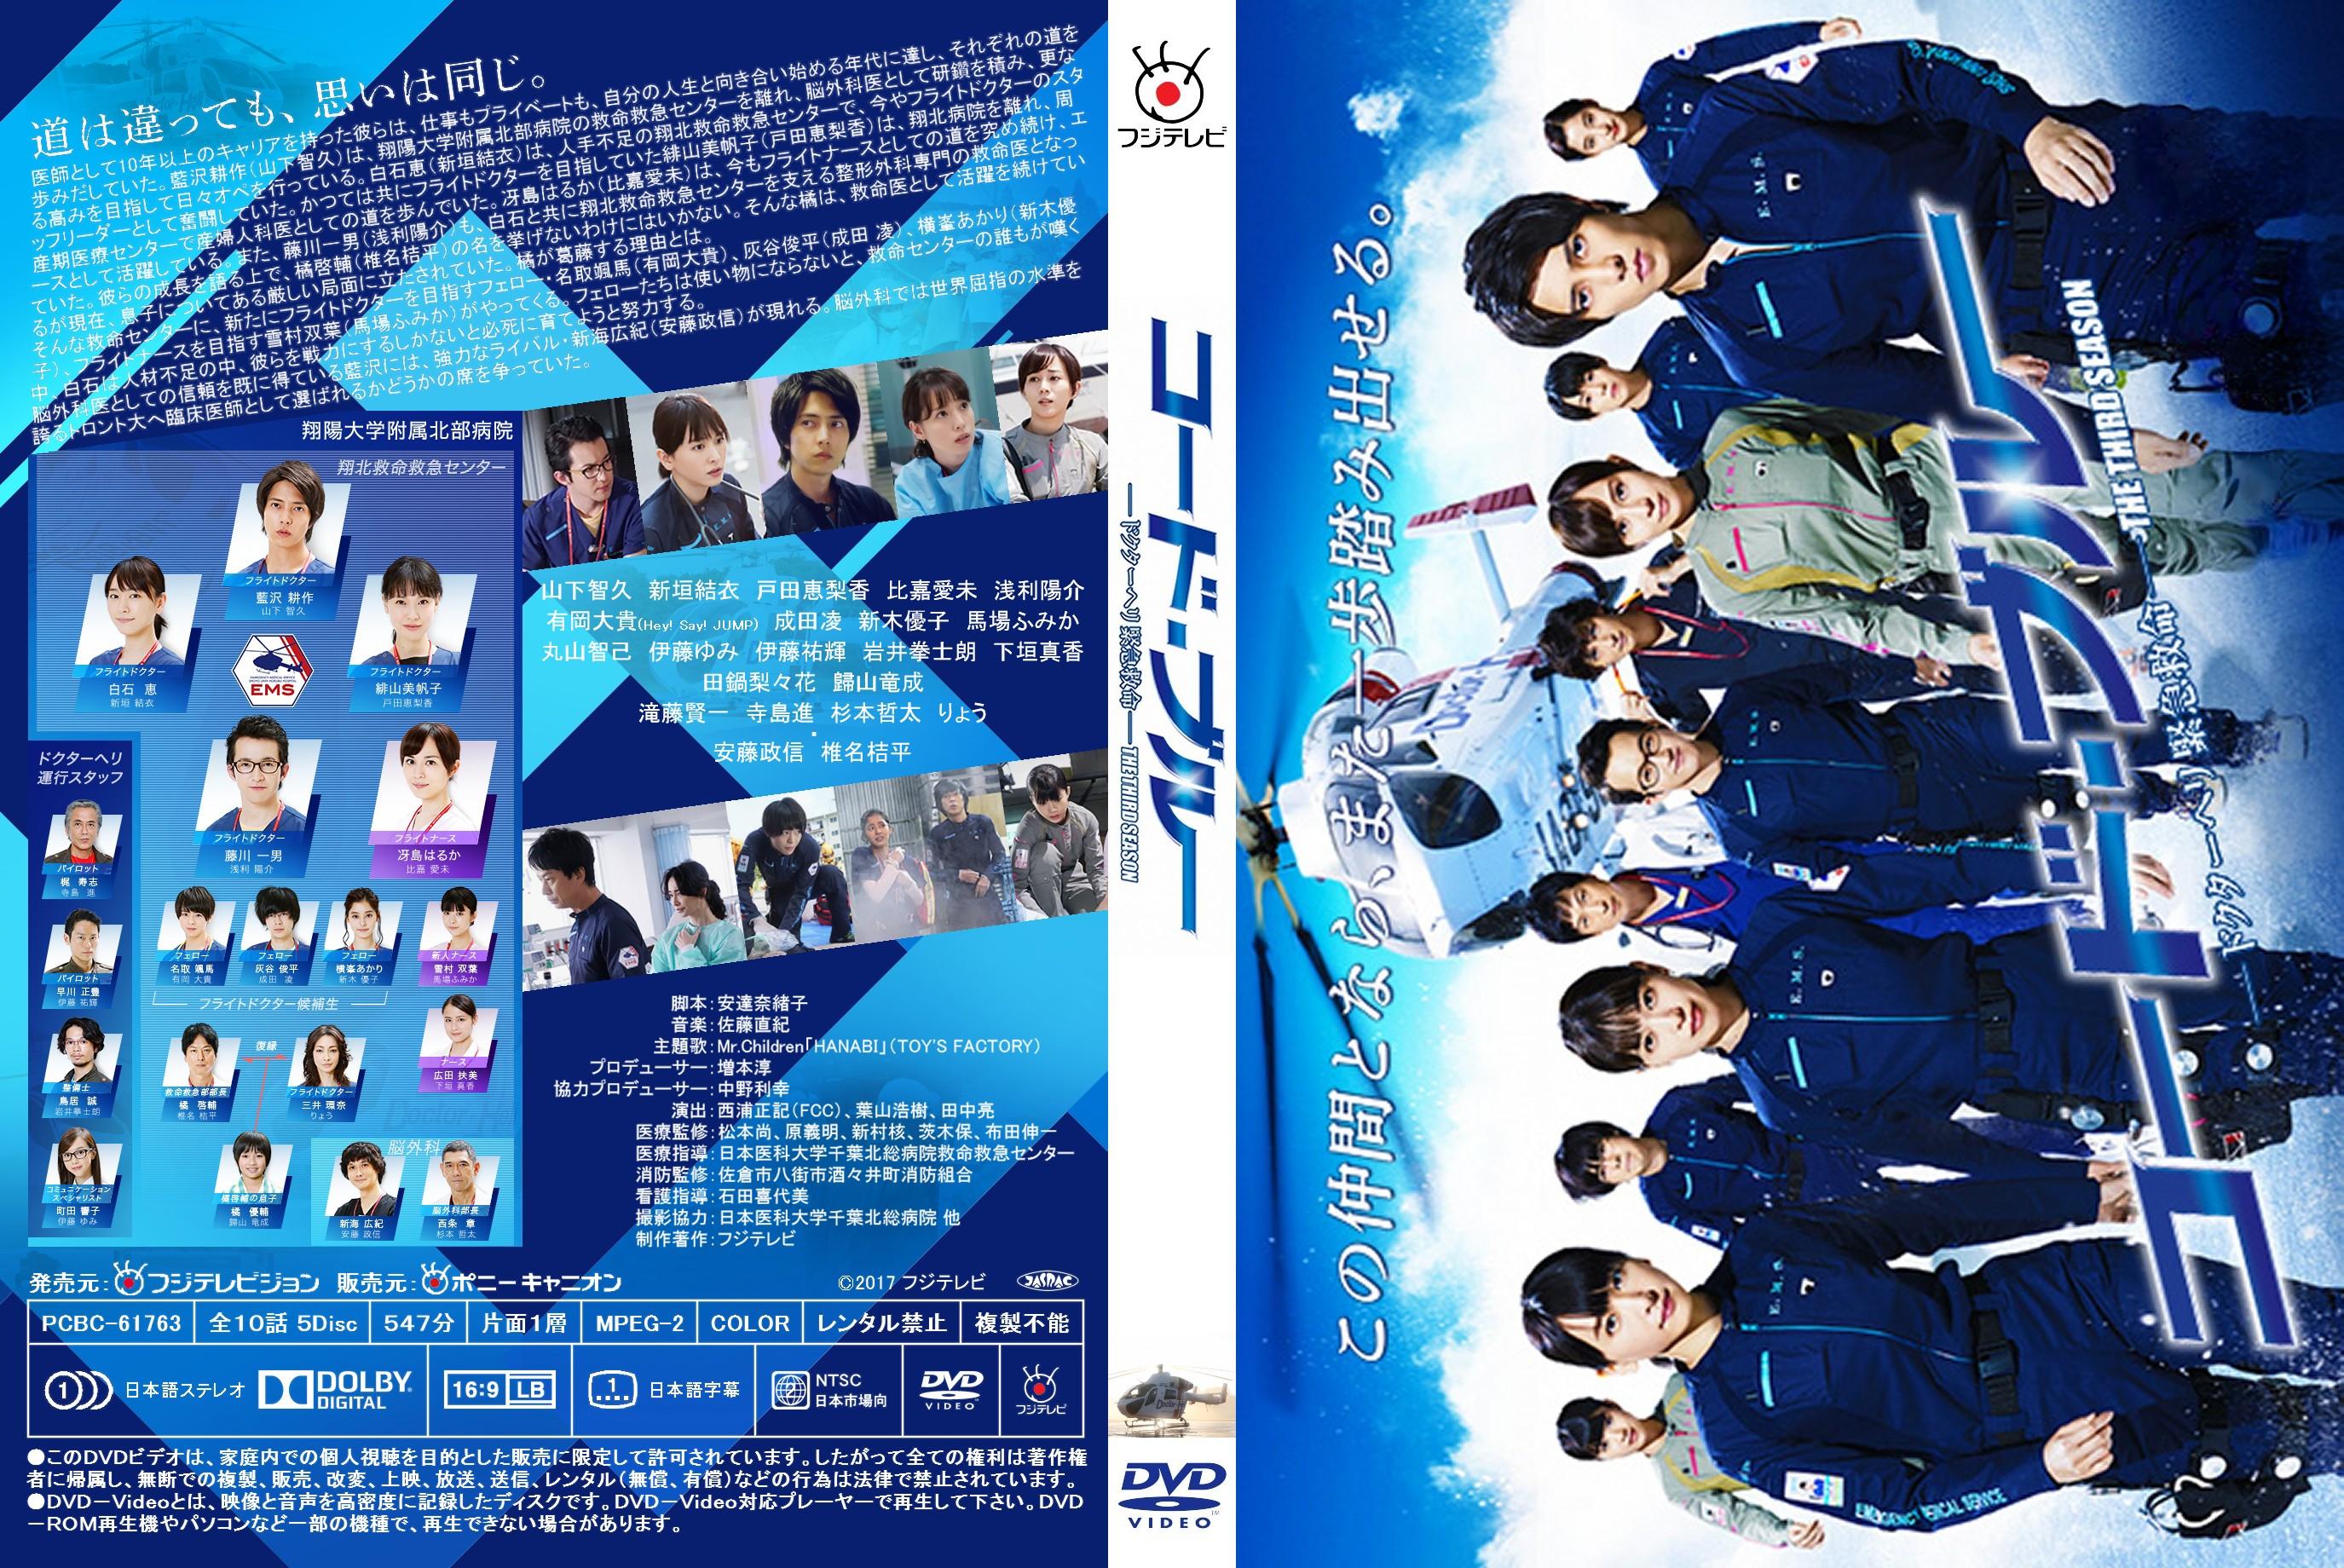 code_blue_3rd.jpg